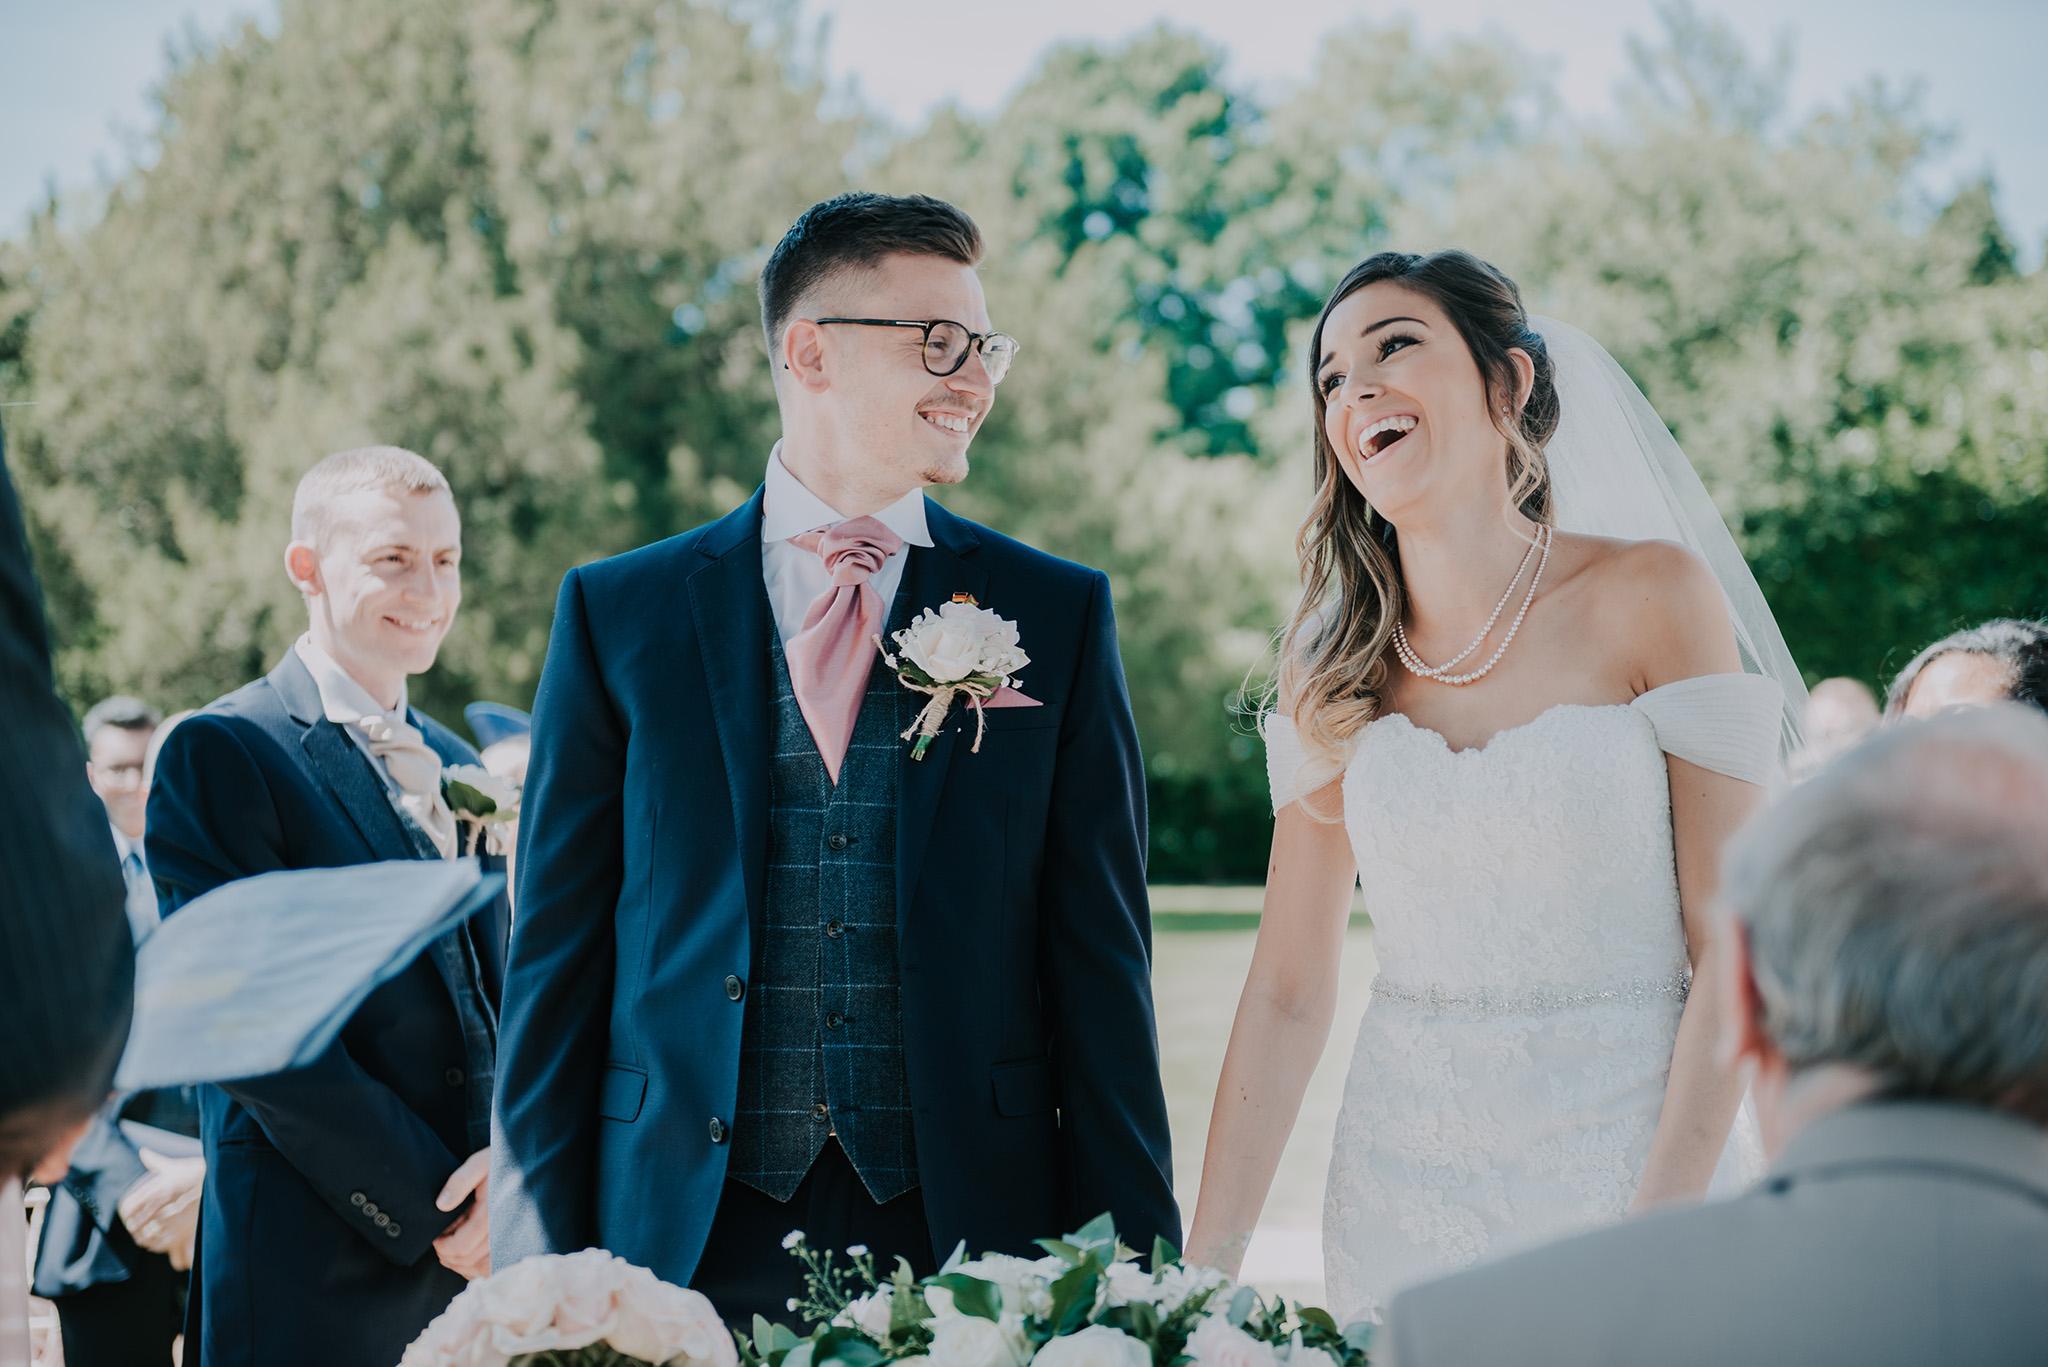 scott-stockwell-photography-wedding-008.jpg